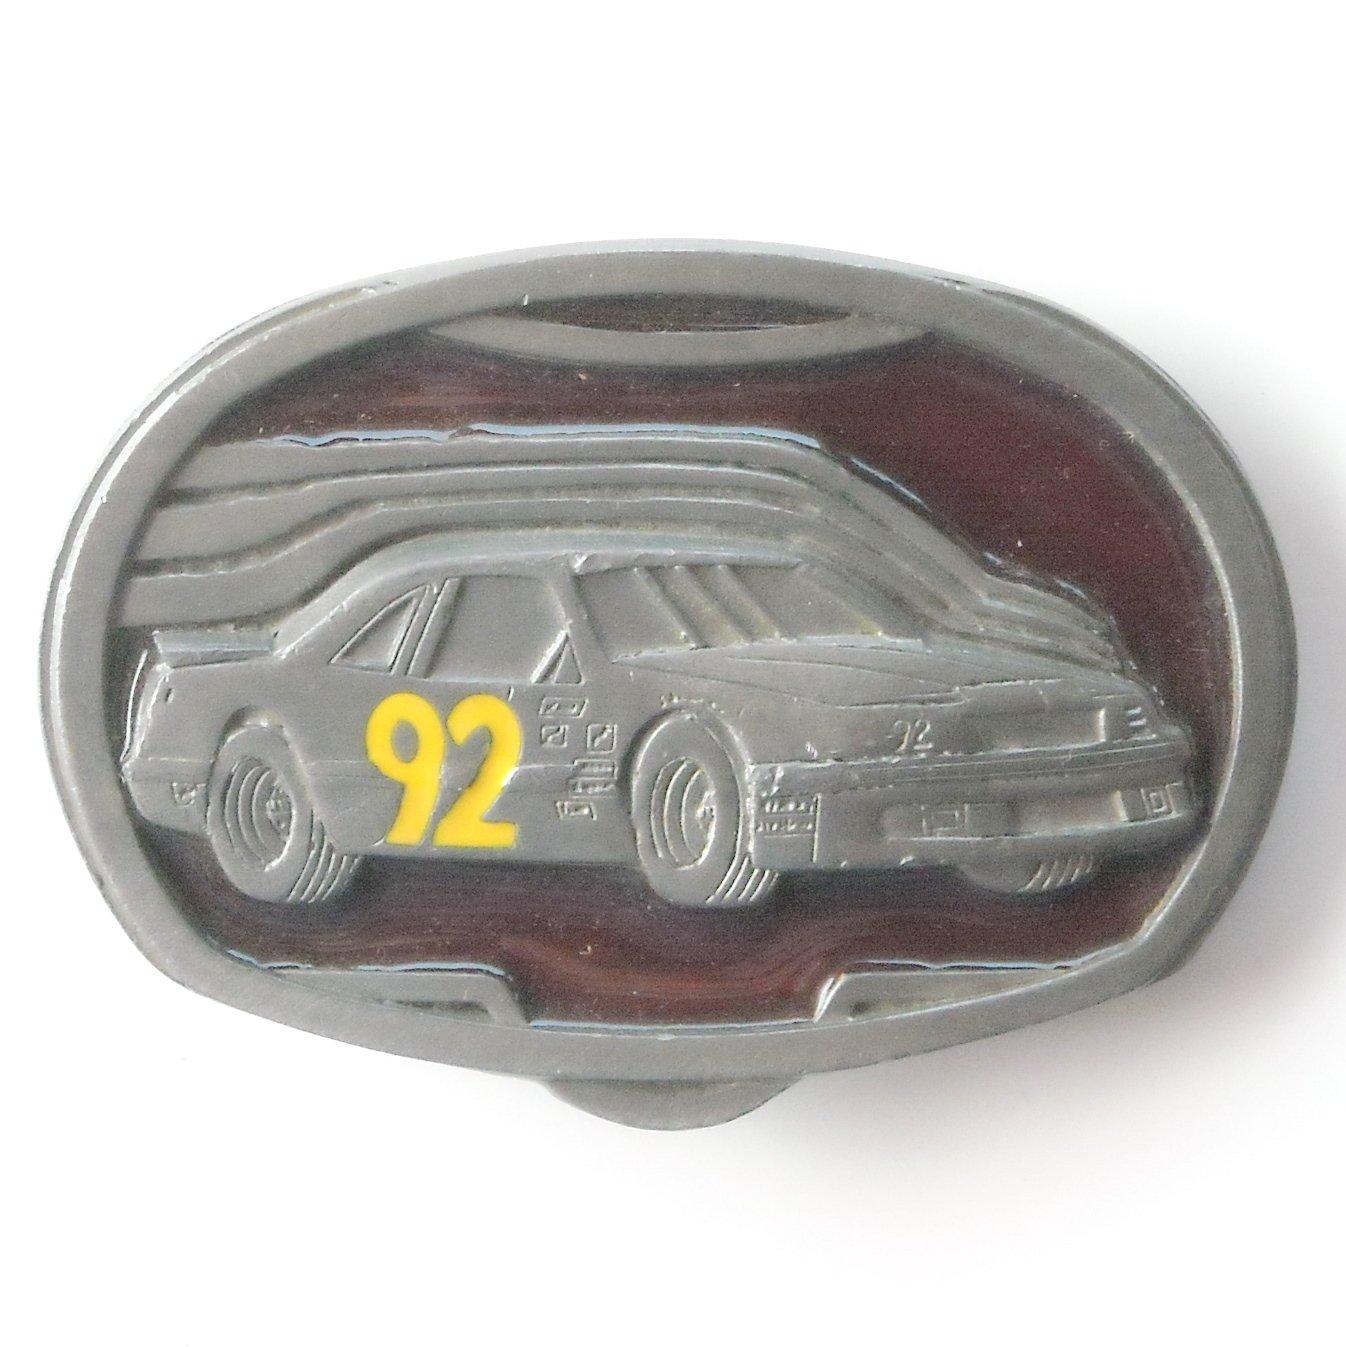 Race Car 92 C+J 1992 Nascar C&J Inc pewter alloy belt buckle #2